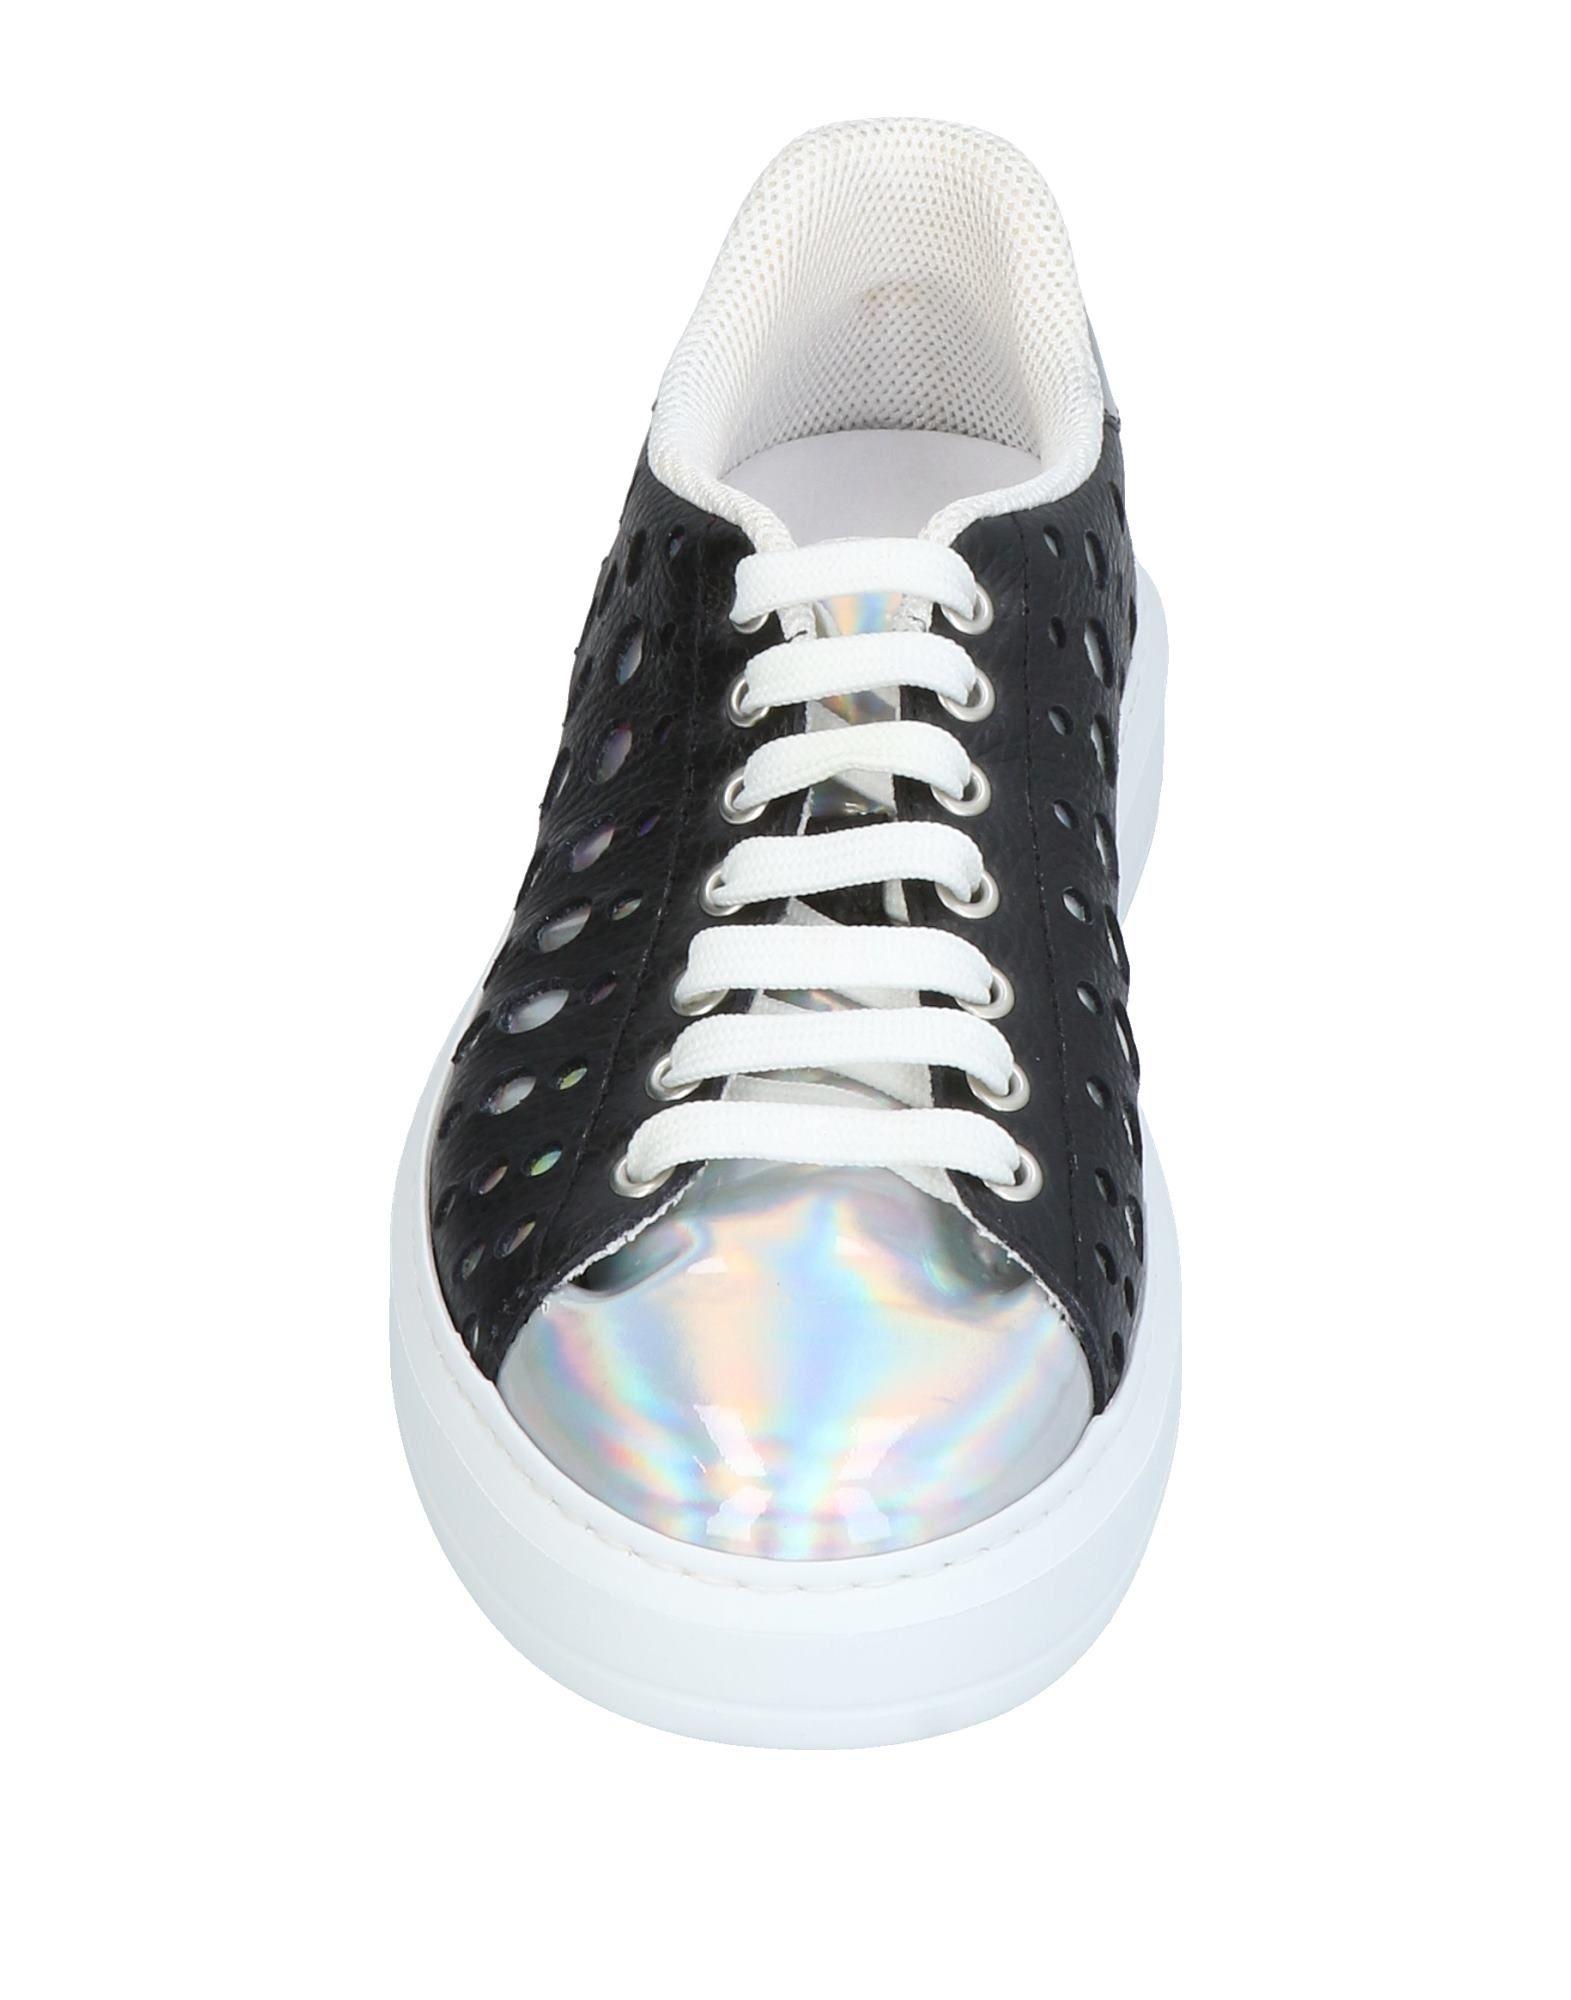 Change Sneakers Qualität Damen  11460179XG Gute Qualität Sneakers beliebte Schuhe 918c66